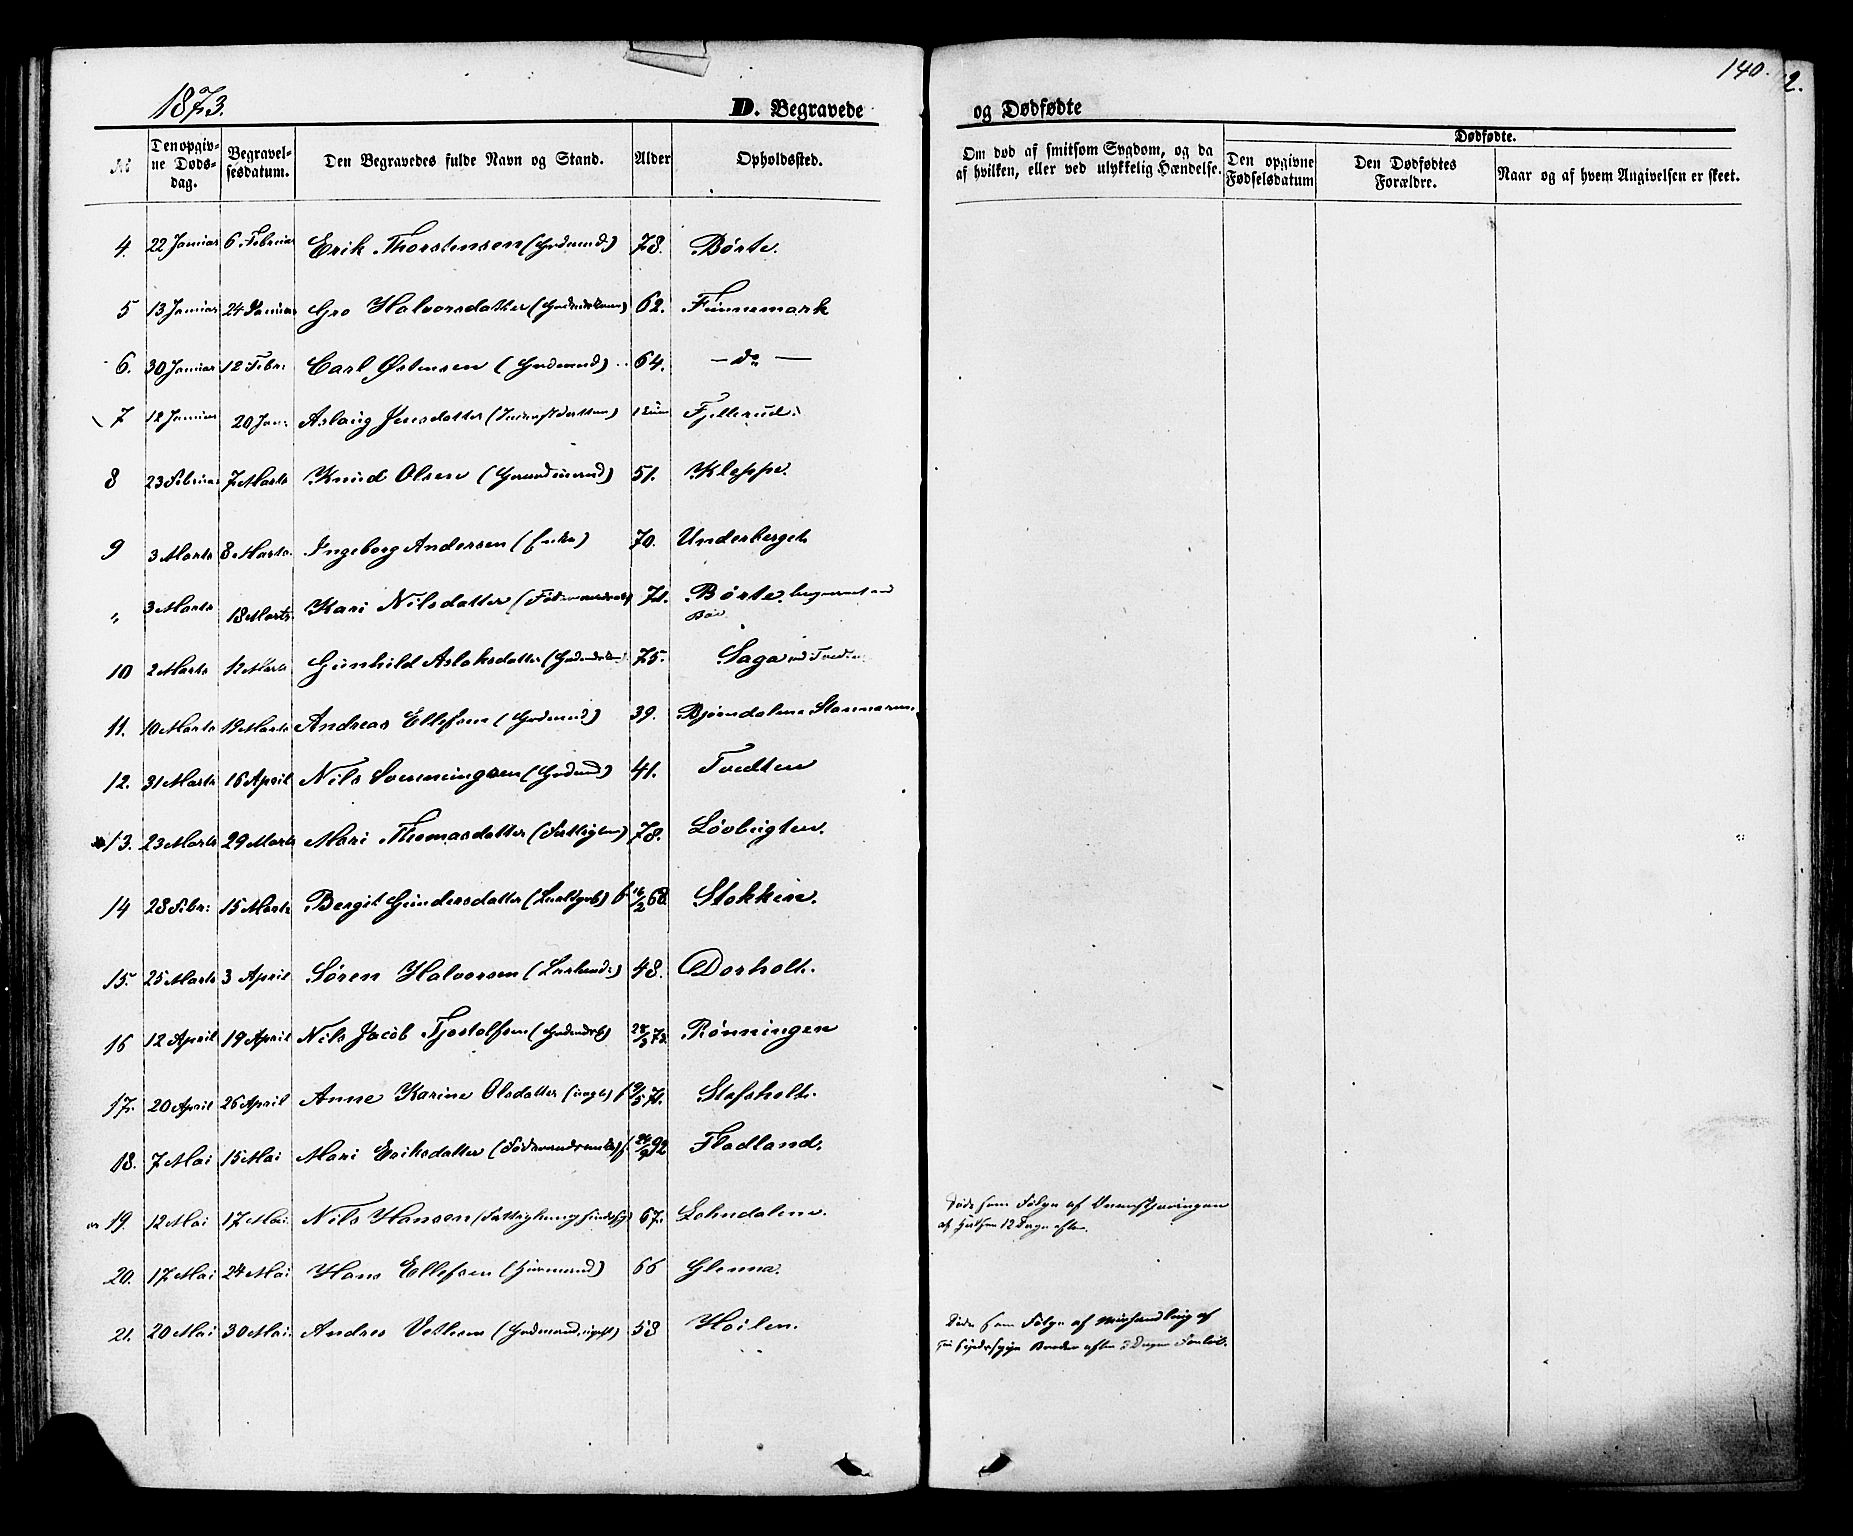 SAKO, Lunde kirkebøker, F/Fa/L0001: Ministerialbok nr. I 1, 1866-1883, s. 140